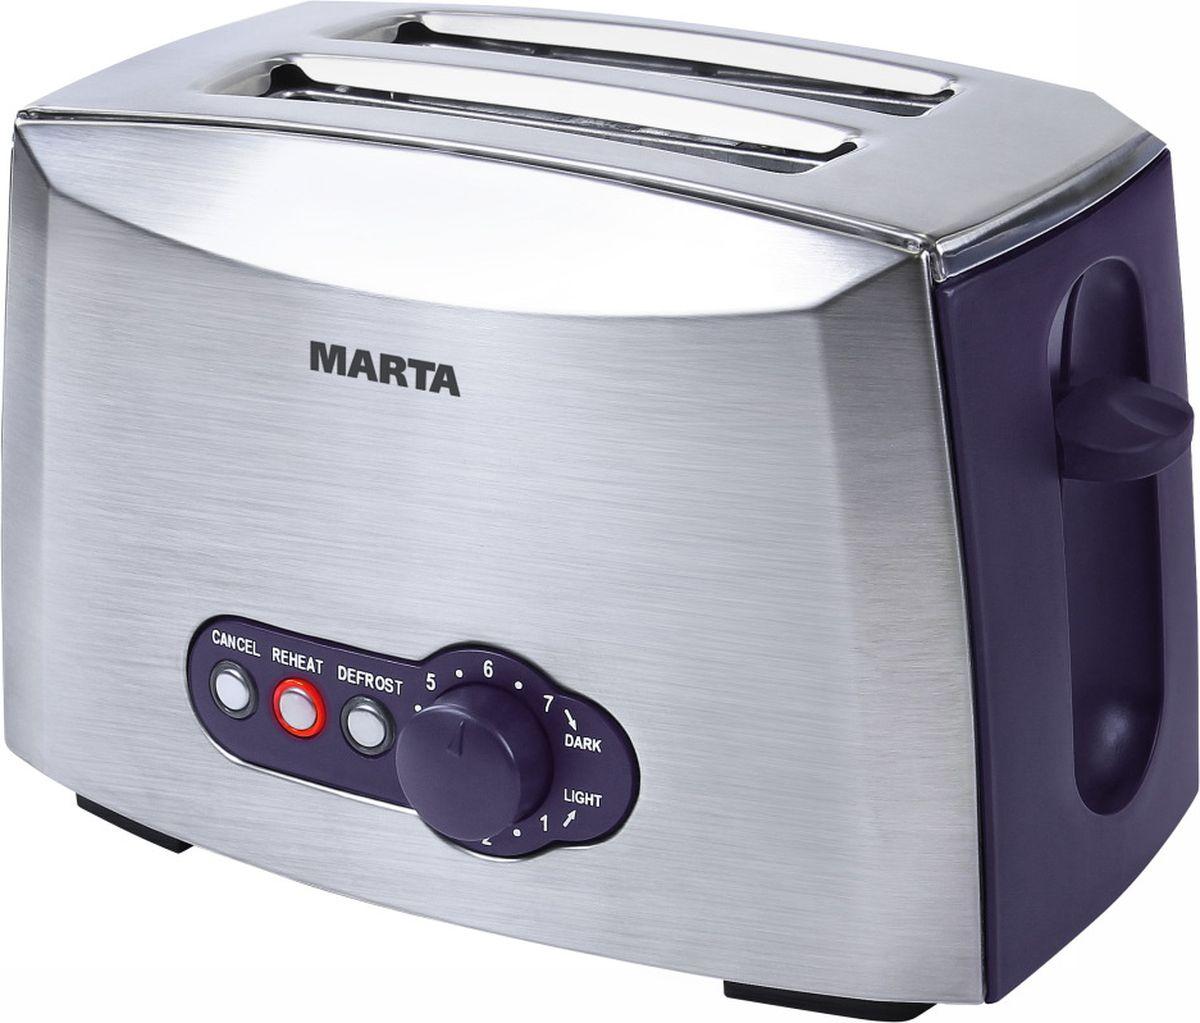 Marta MT-1705, Dark Topaz тостер - Тостеры